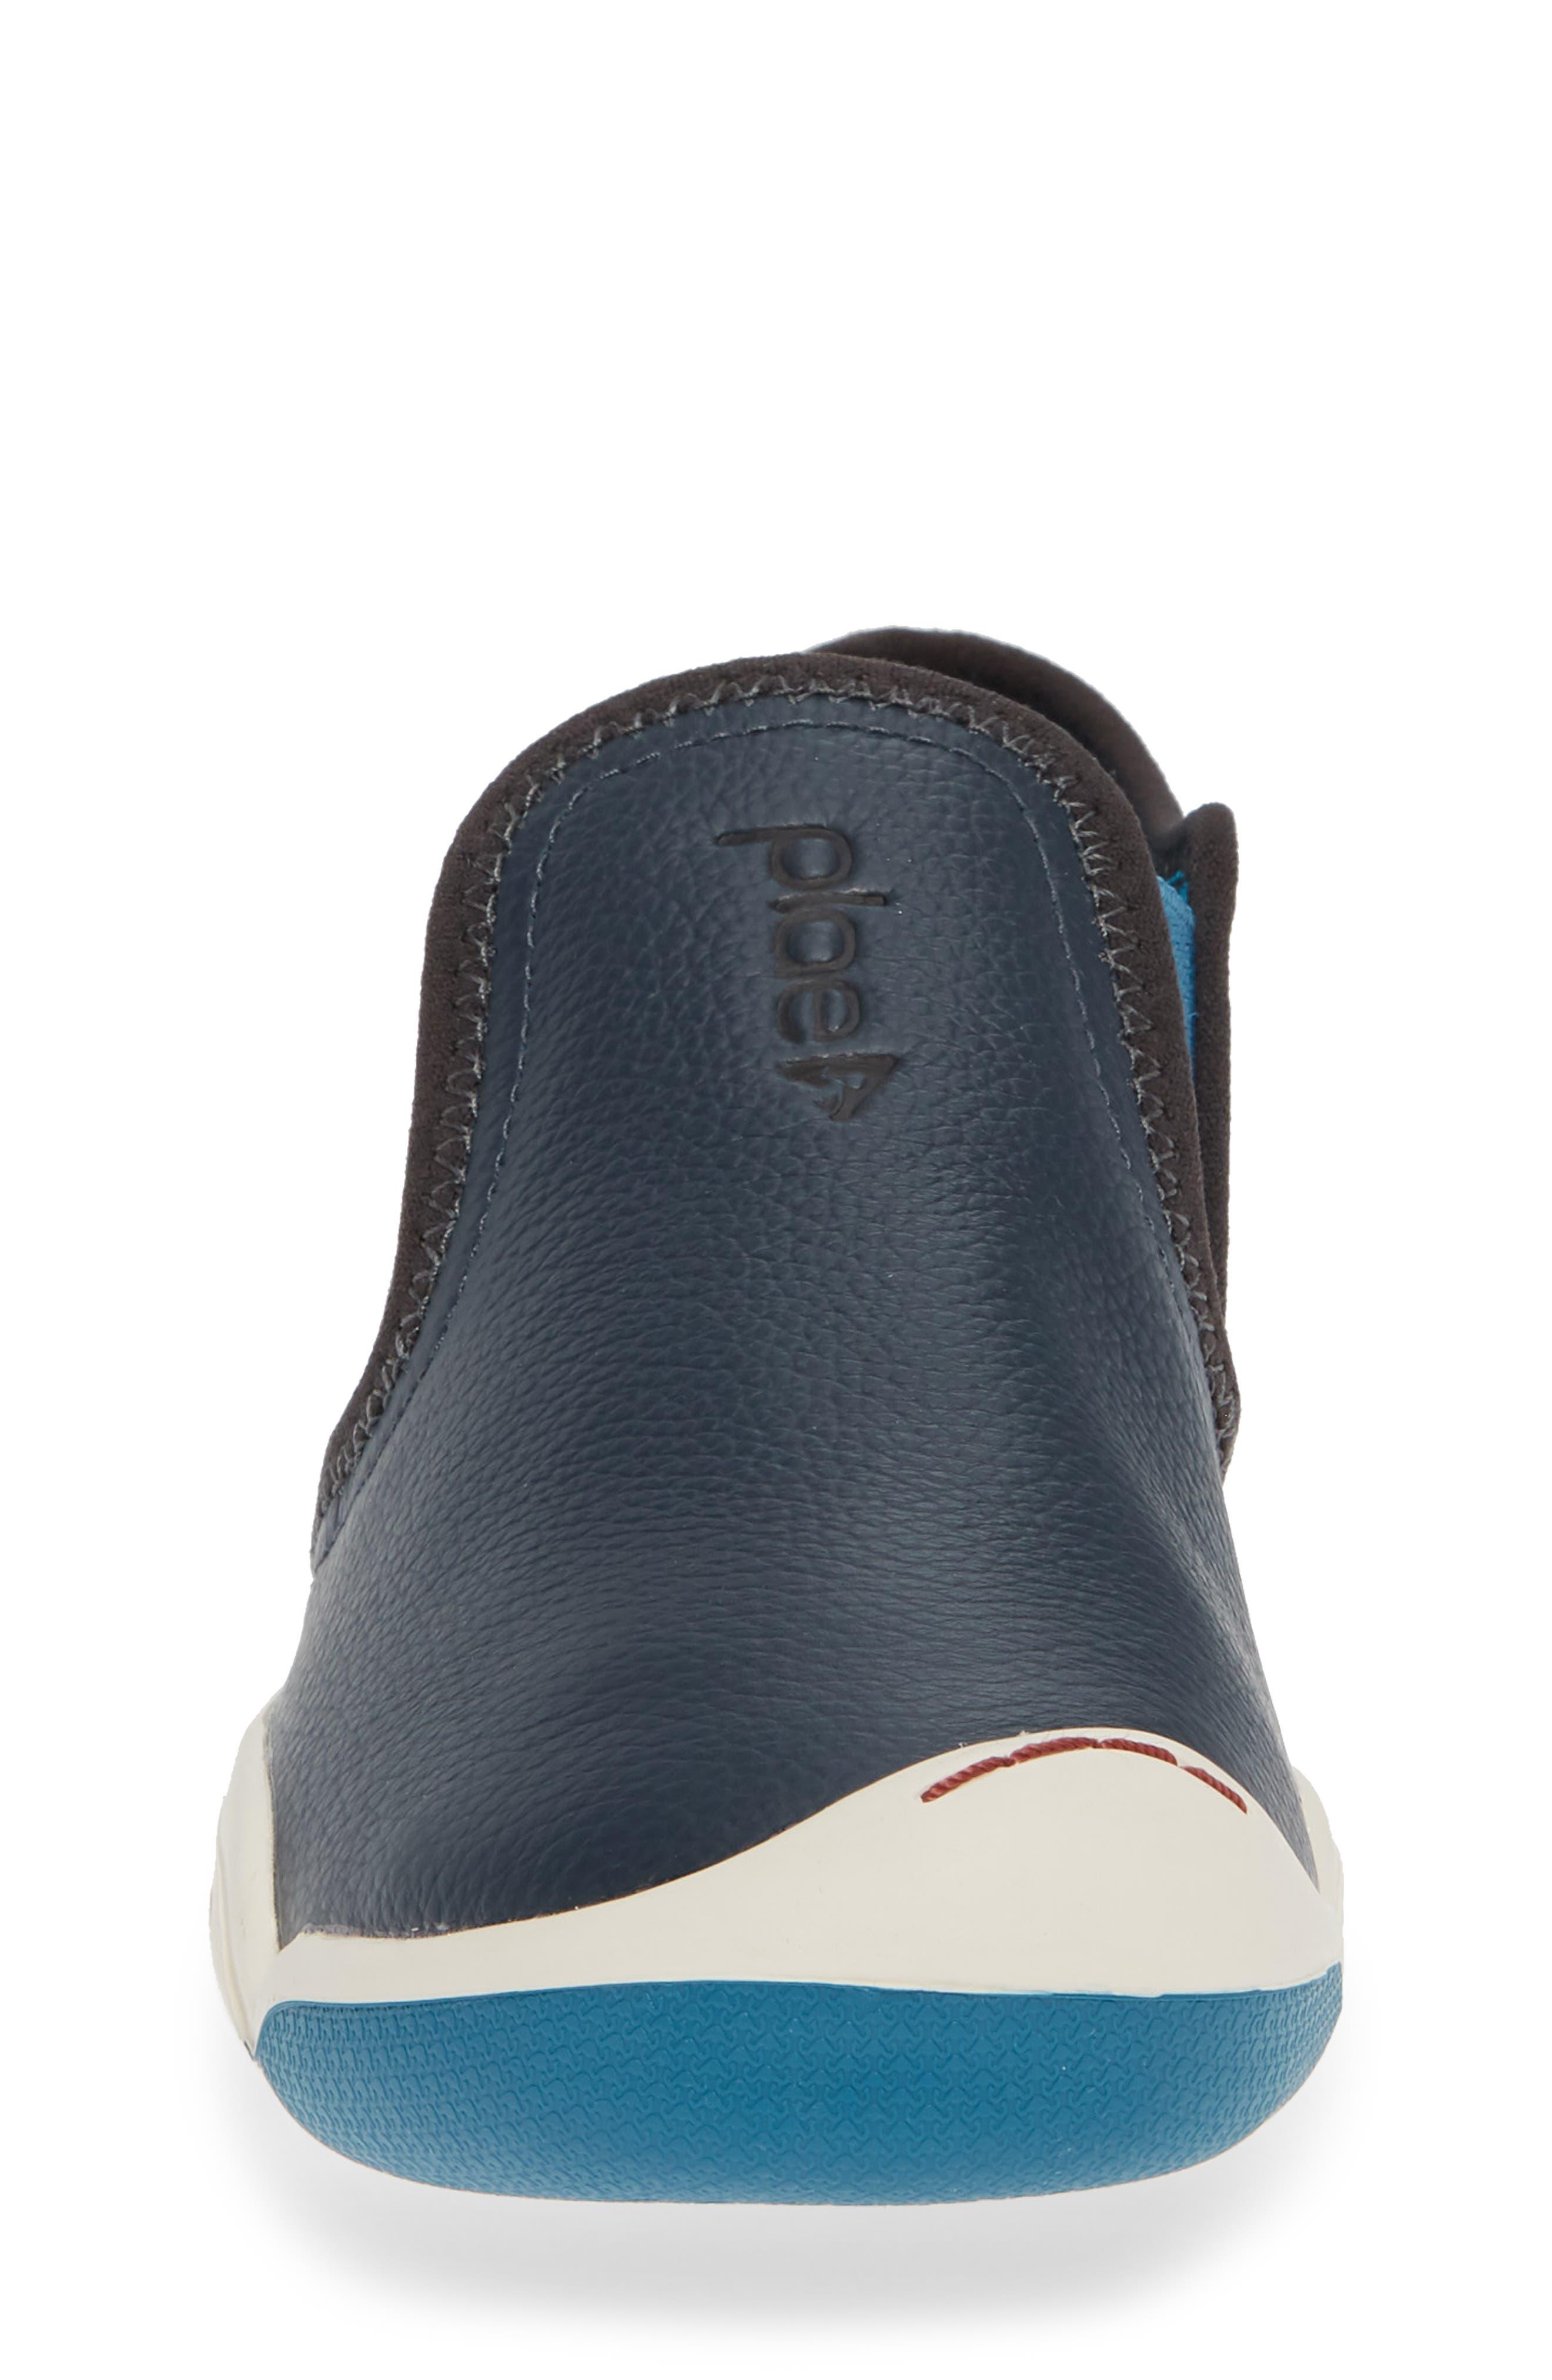 Migi Slip-On Sneaker,                             Alternate thumbnail 4, color,                             Octo Ink